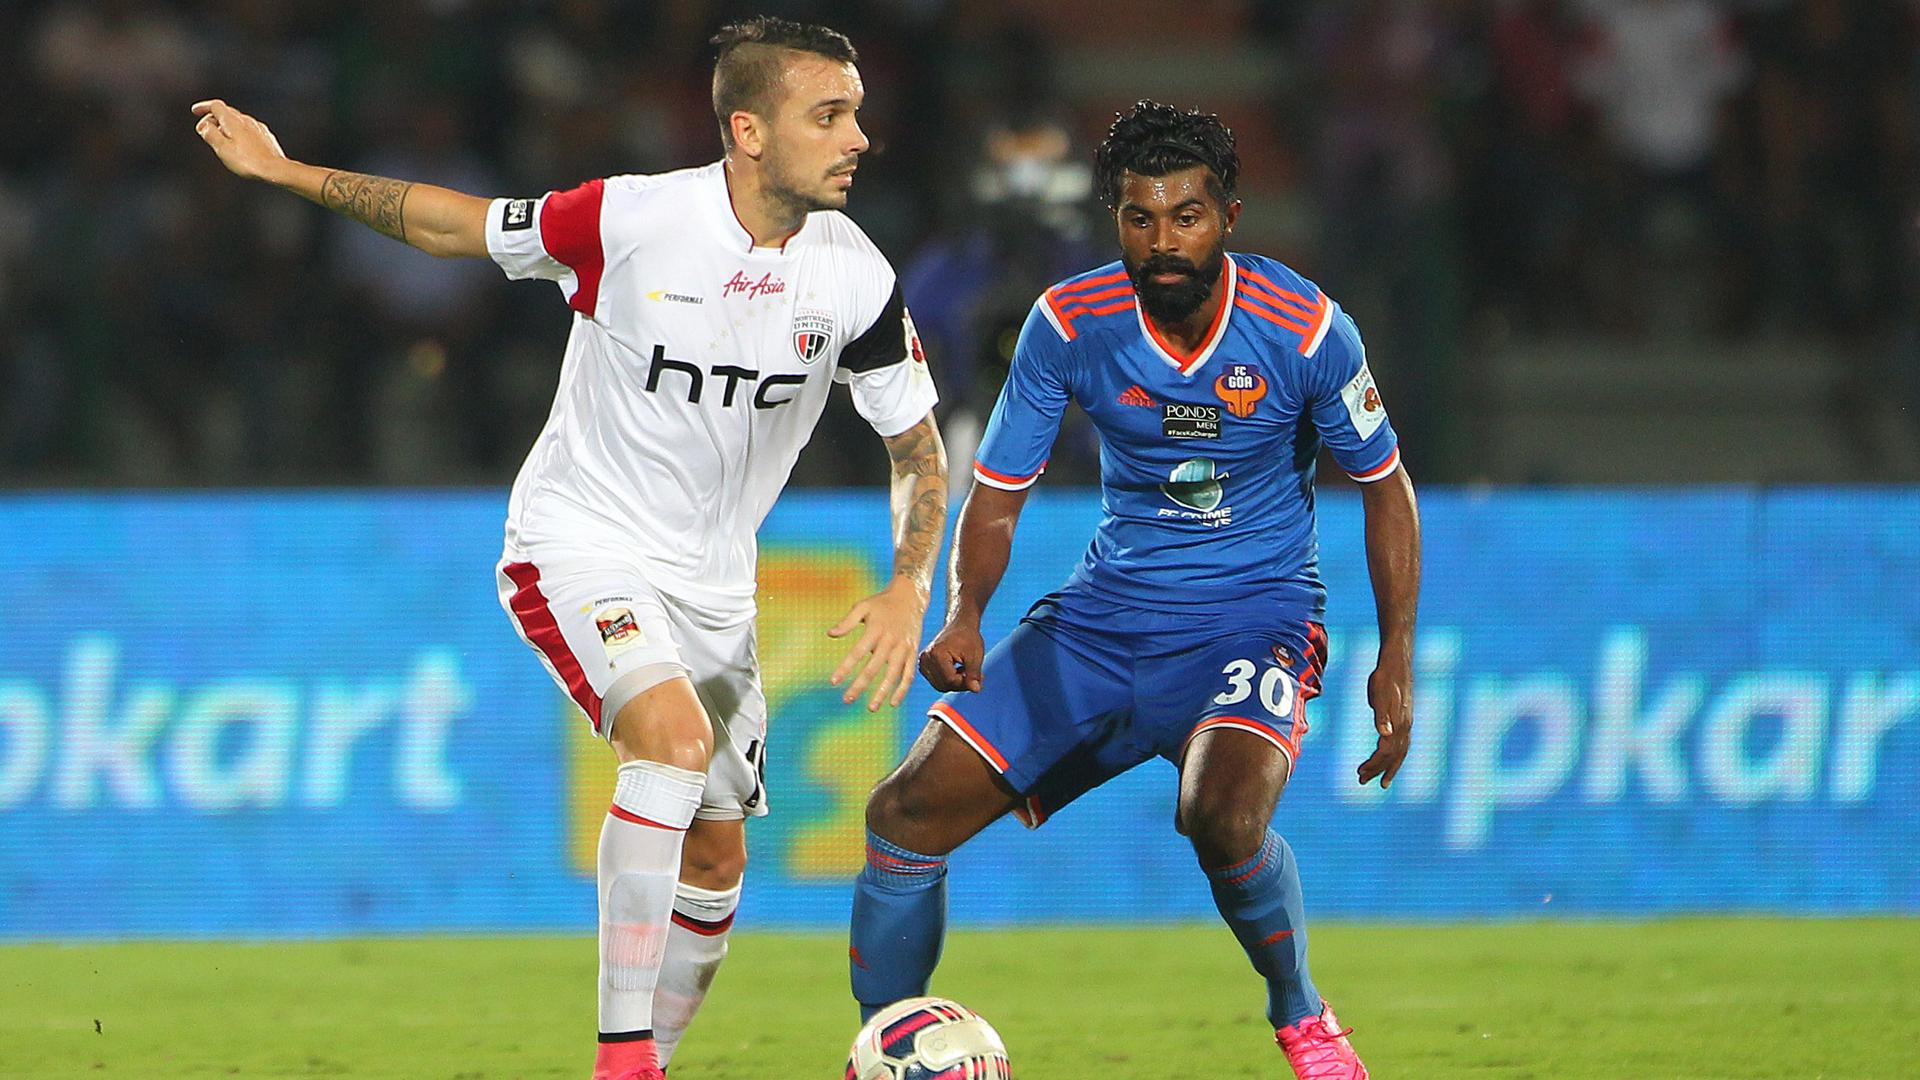 Nicolas Velez C.S Sabeeth NorthEast United FC FC Goa ISL season 2